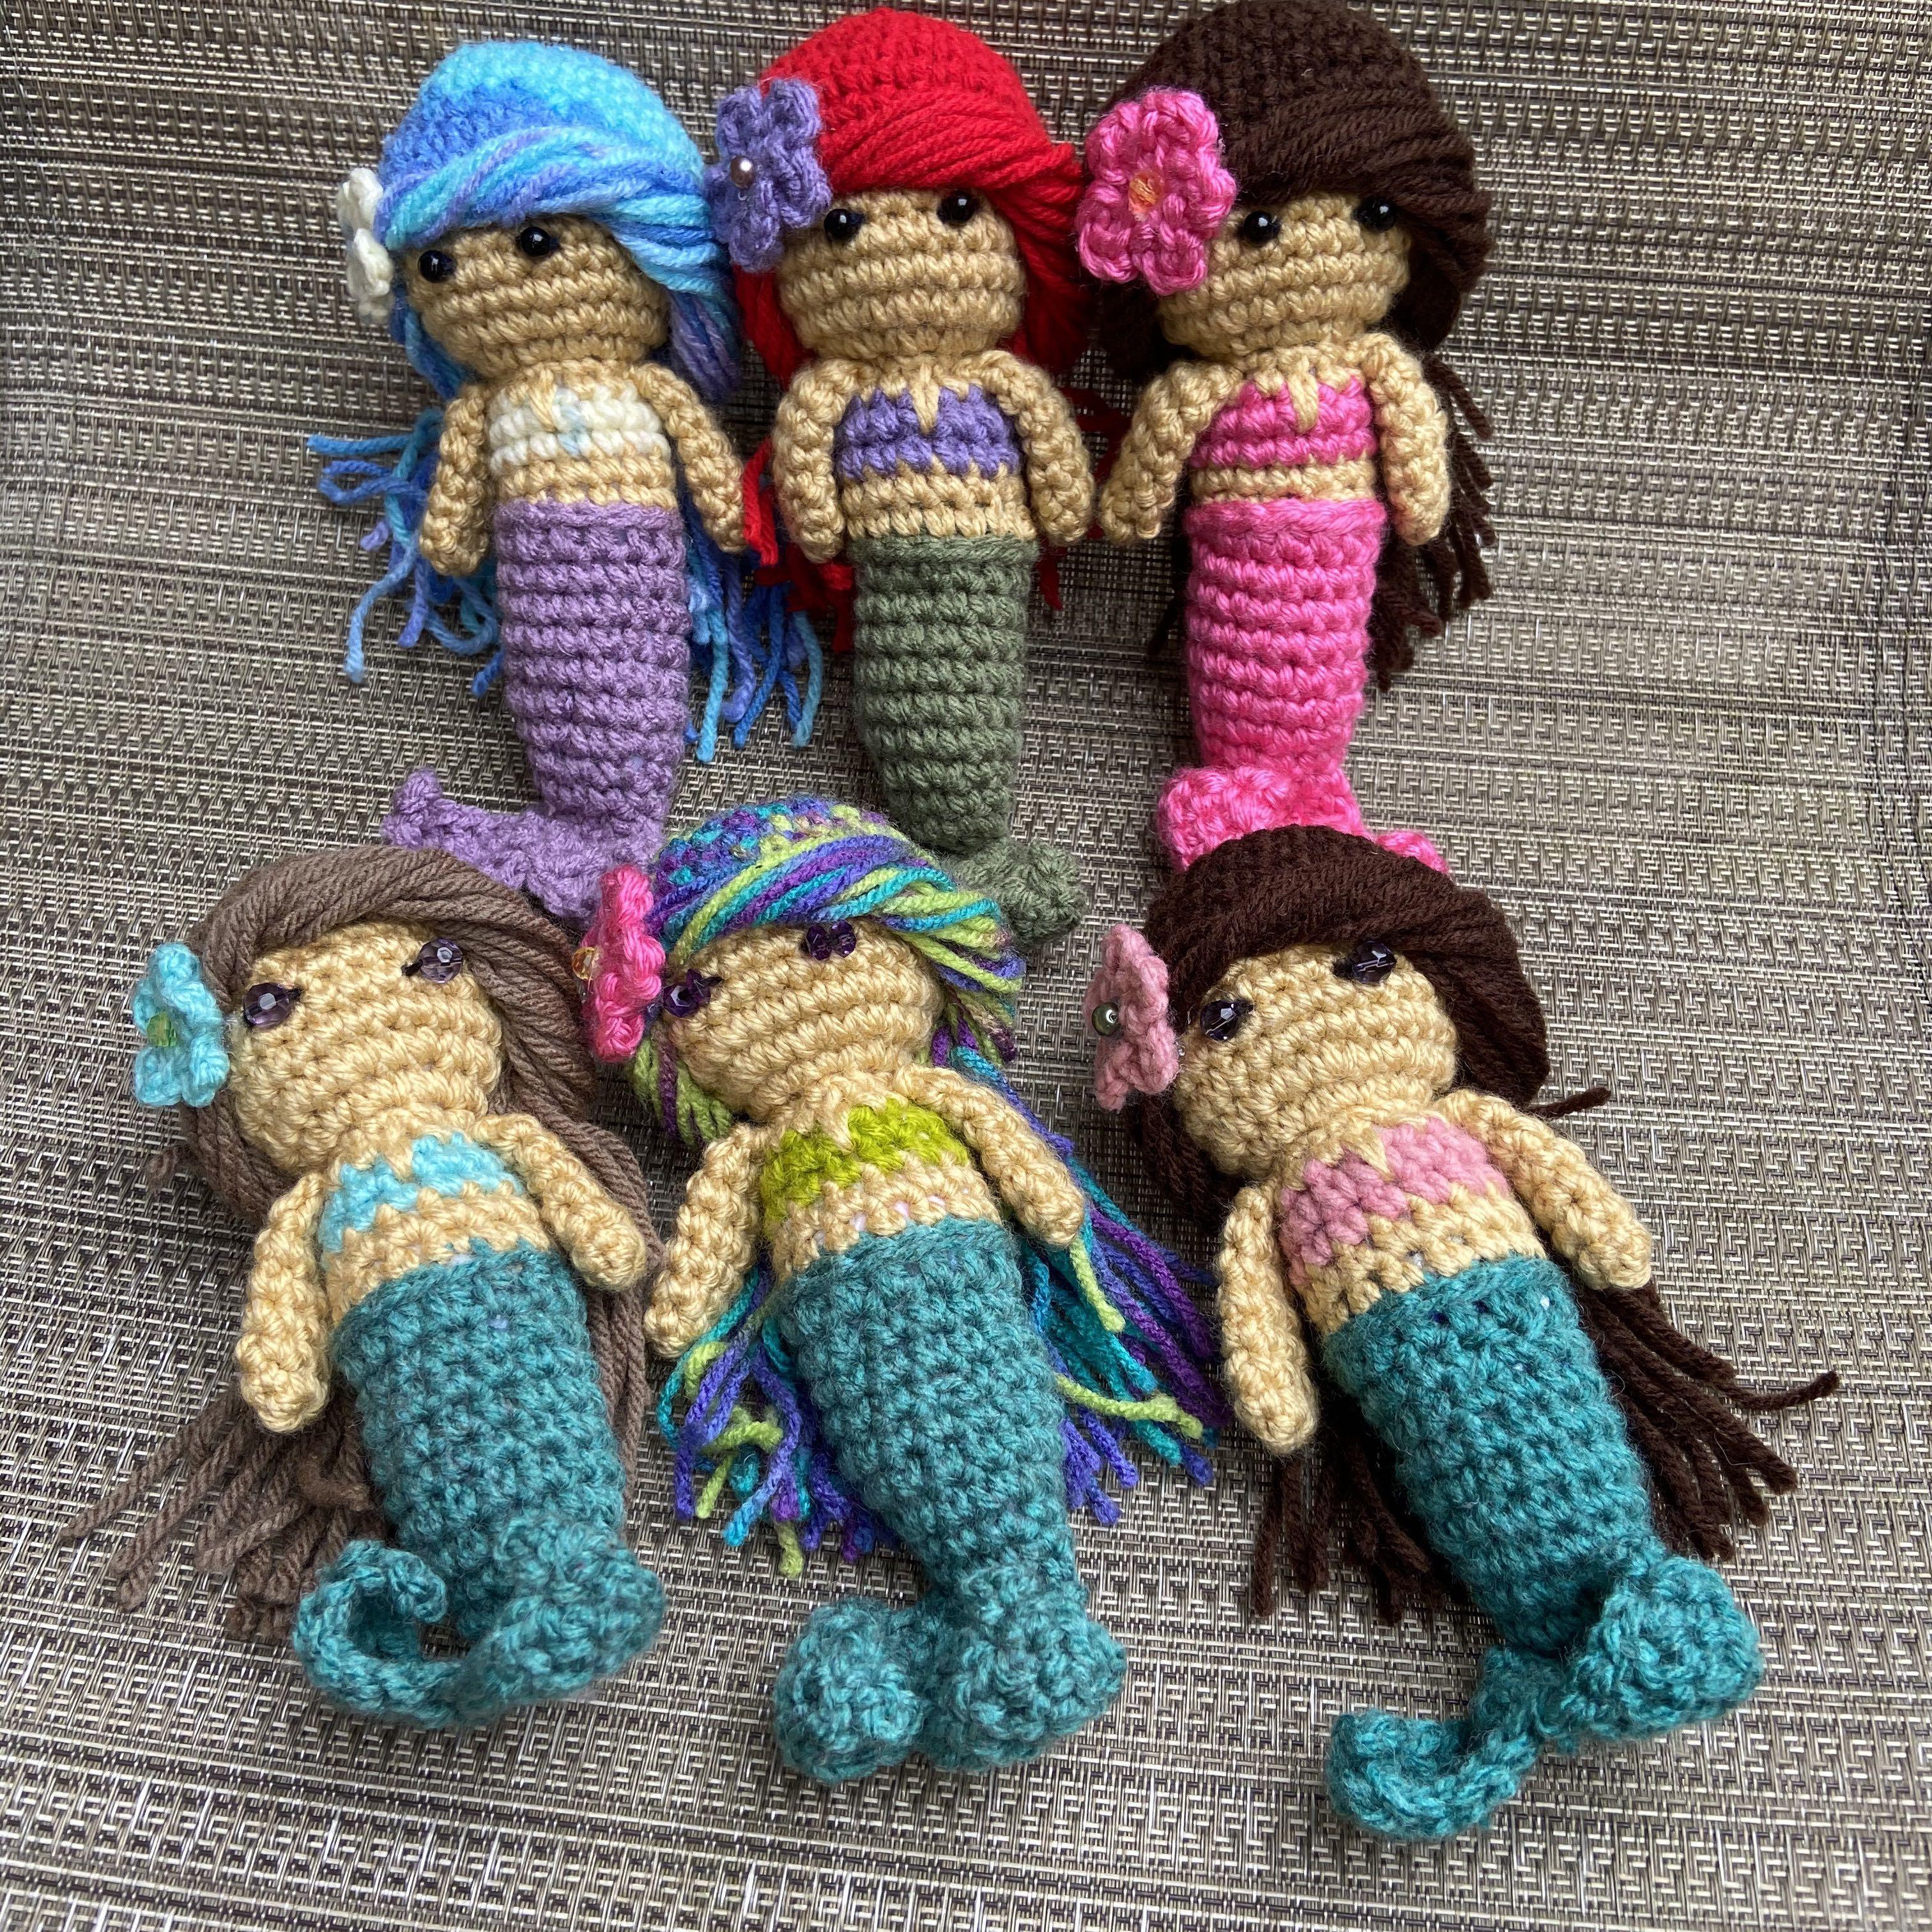 Handmade Crochet Mermaid dolls